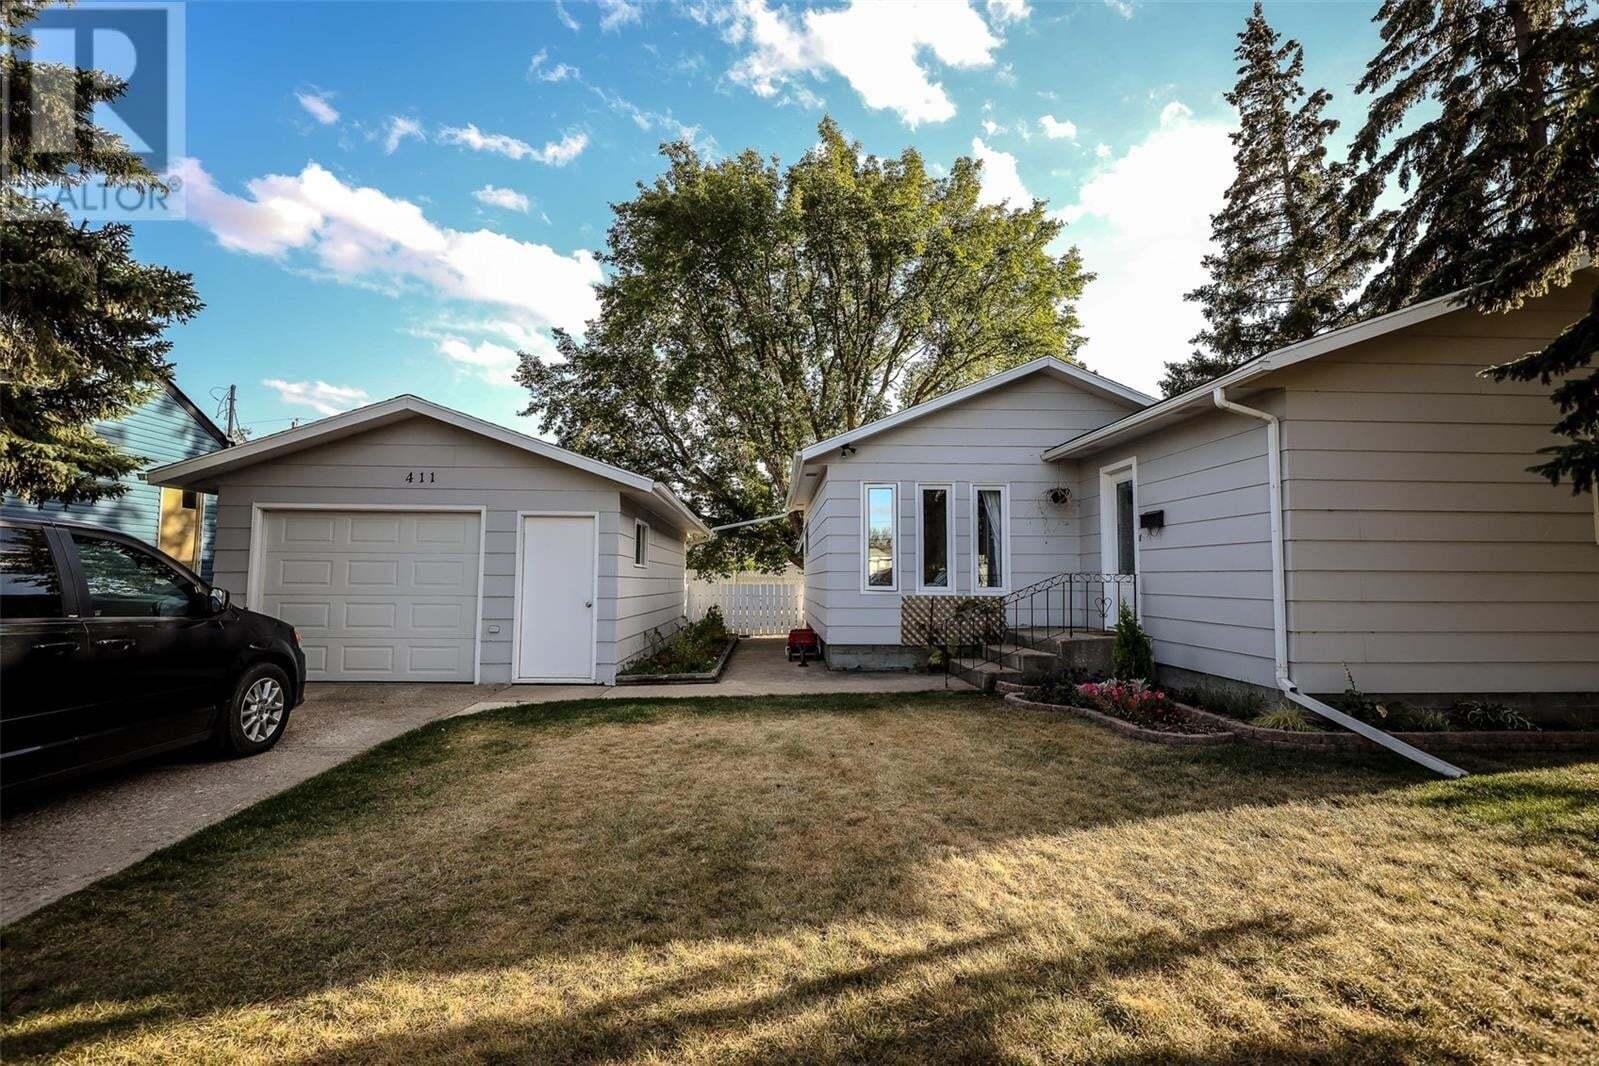 House for sale at 411 Main St W Warman Saskatchewan - MLS: SK828901